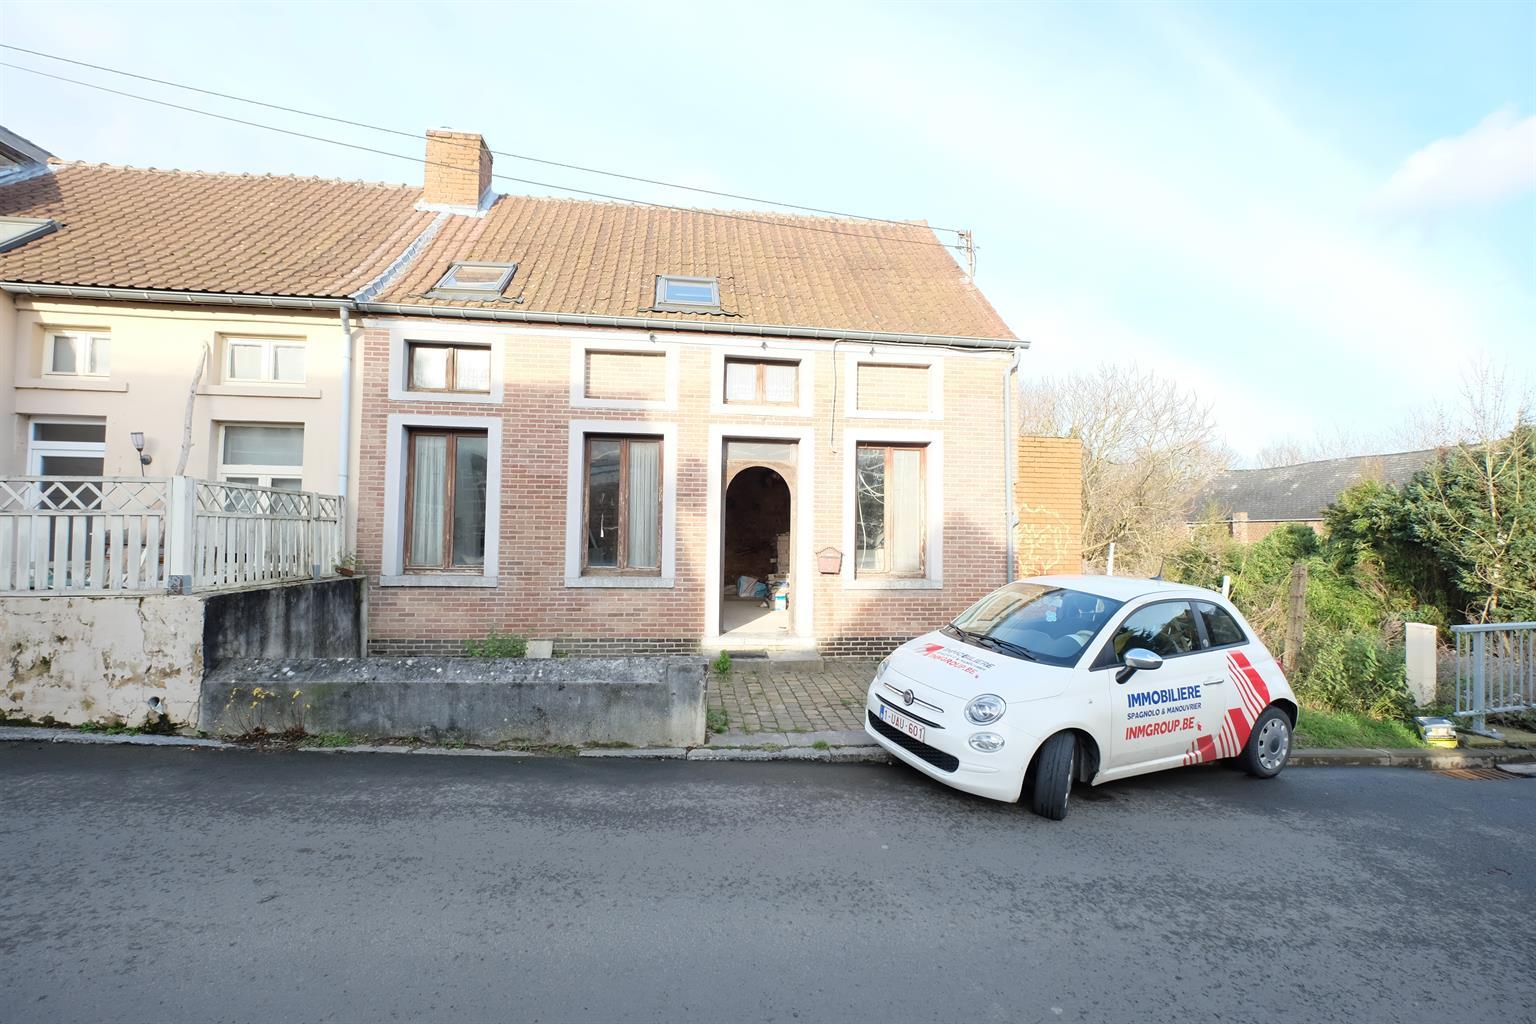 Maison - Tubize Oisquercq - #4252207-0